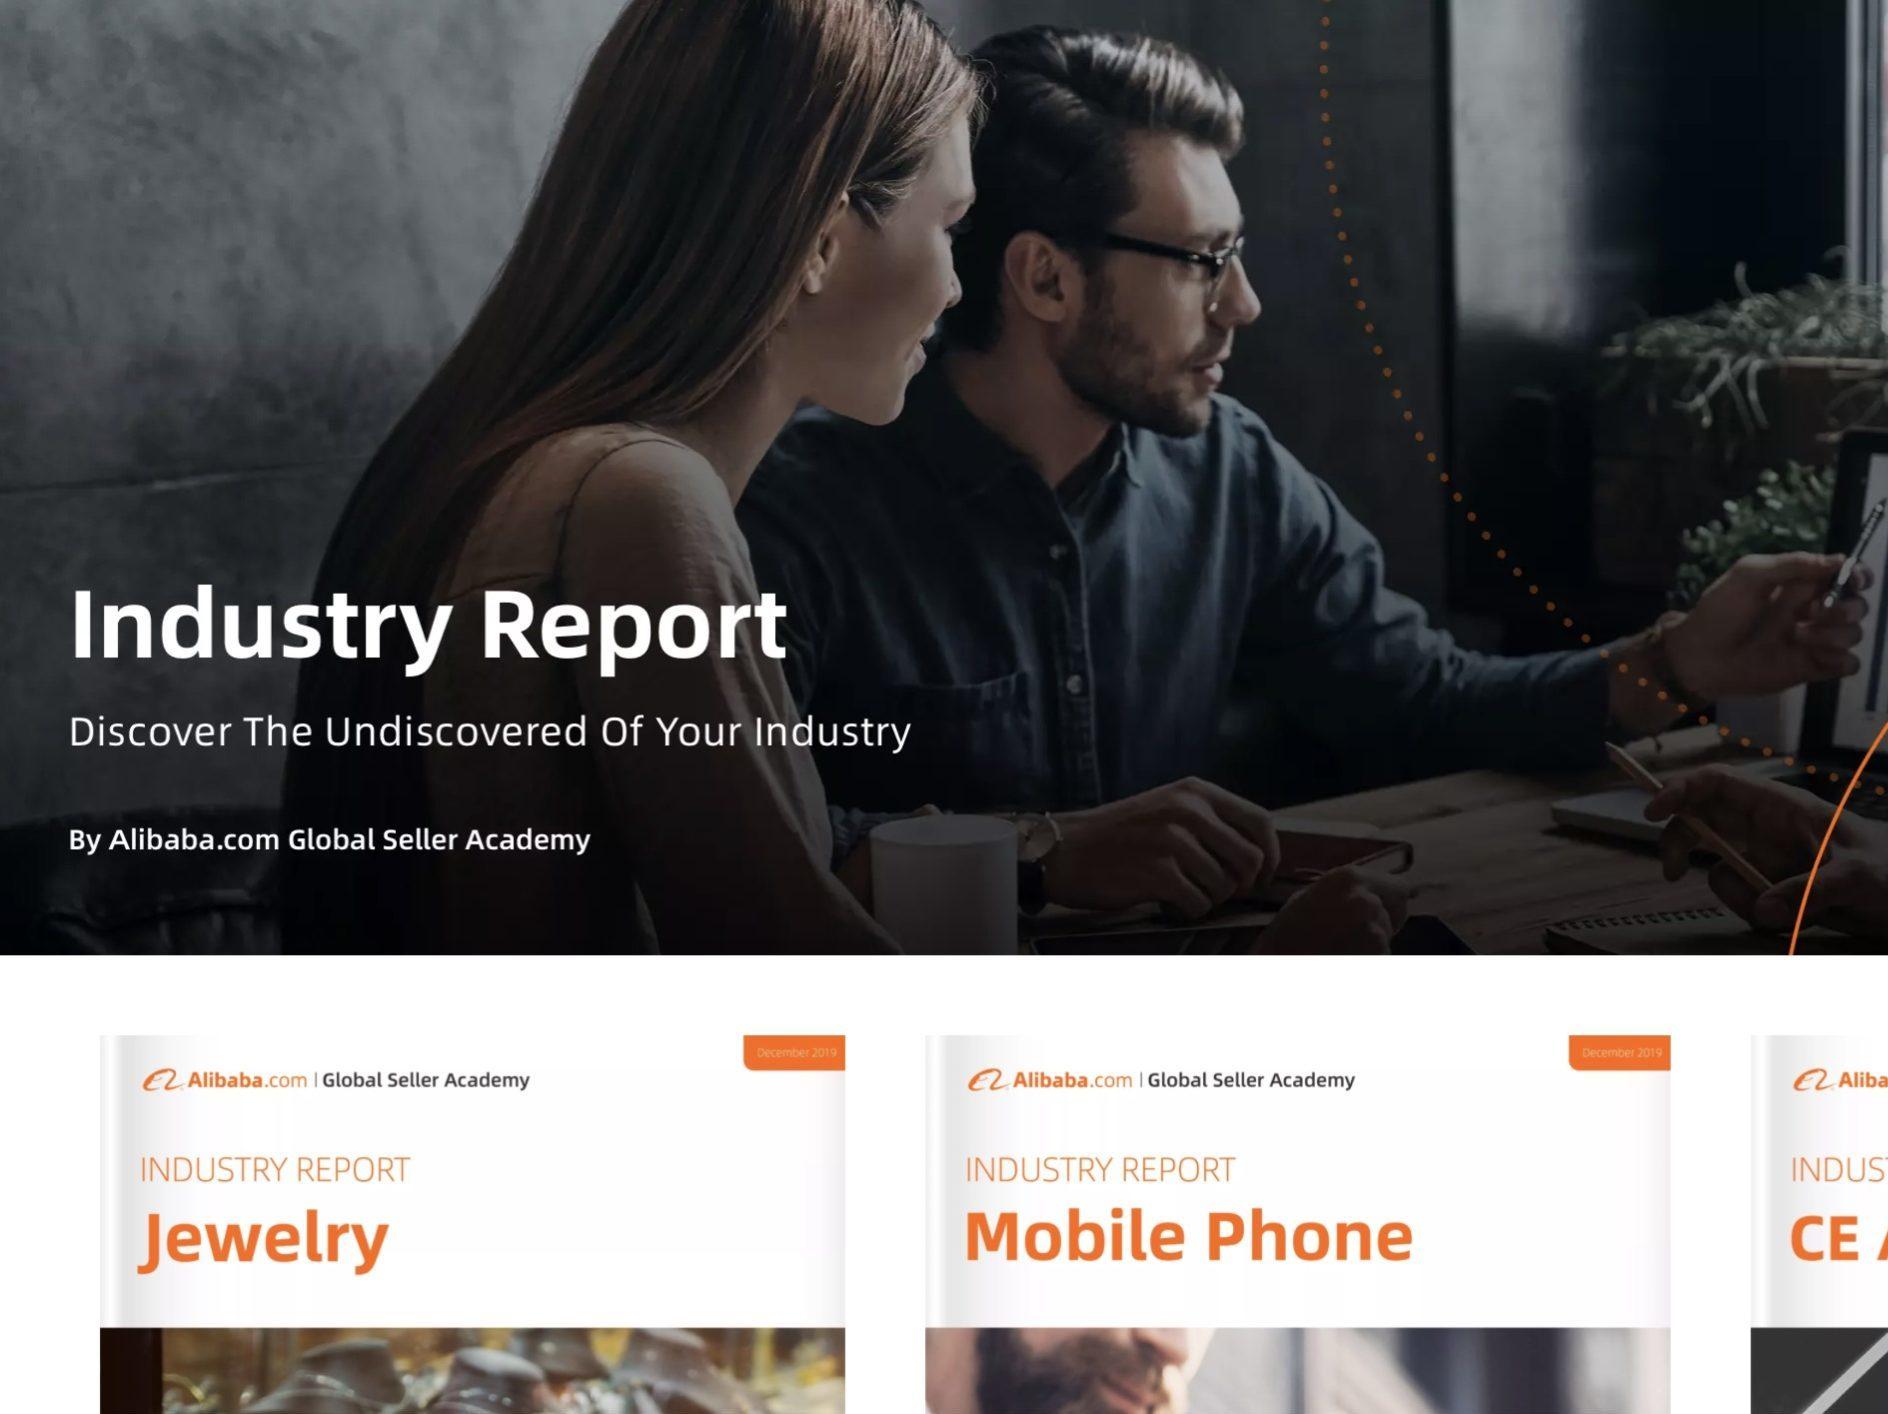 Отчет. Alibaba.com предоставила аналитику по категориям индустрии товаров